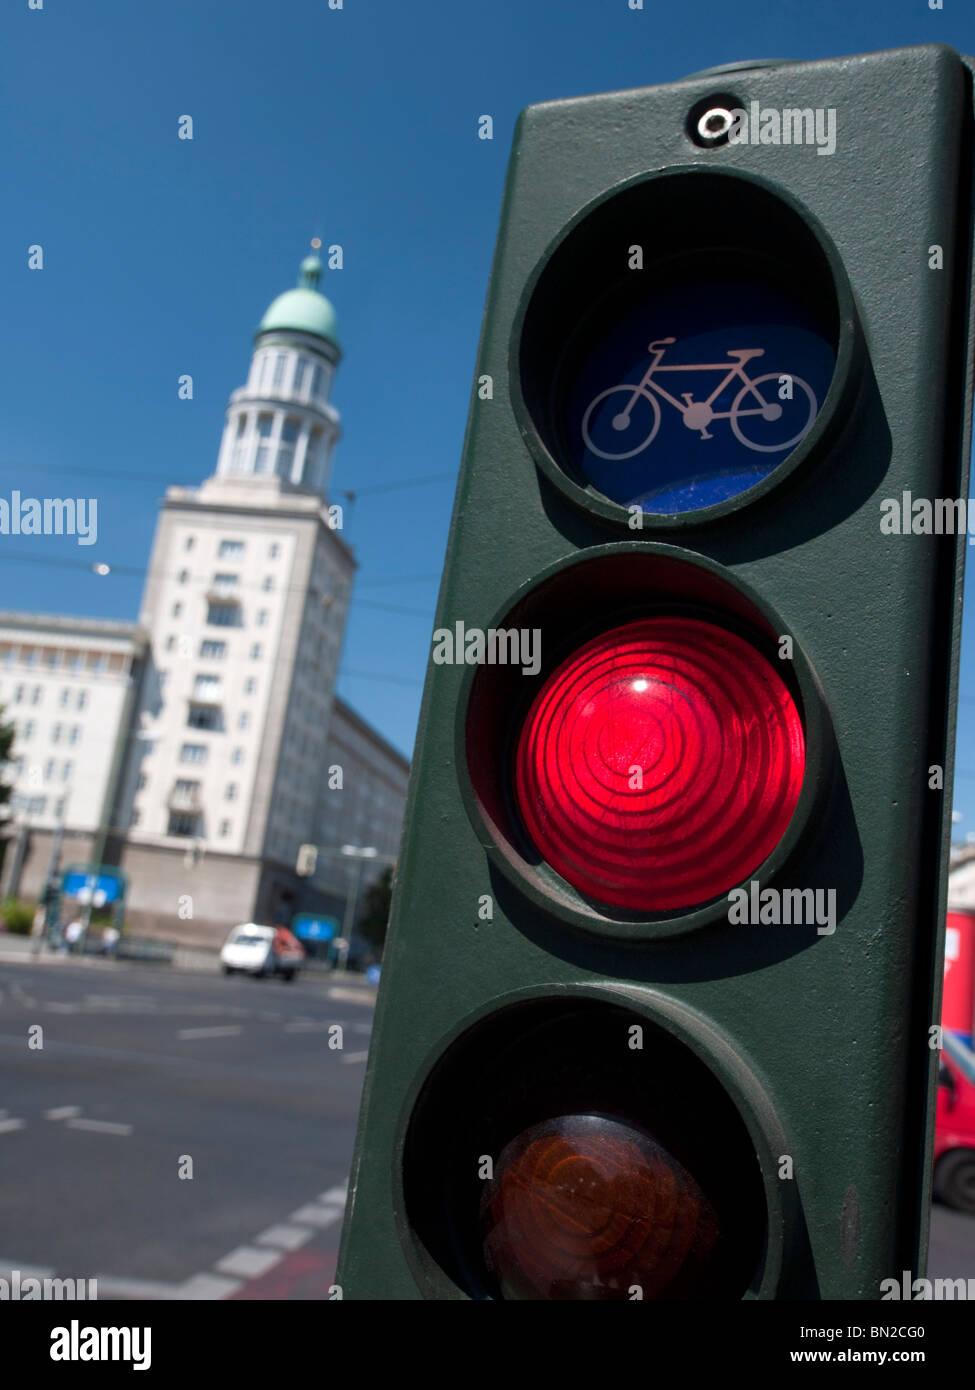 Bicycle traffic lights at Frankfurter Tor on Karl Marx Allee in former east Berlin in Germany - Stock Image